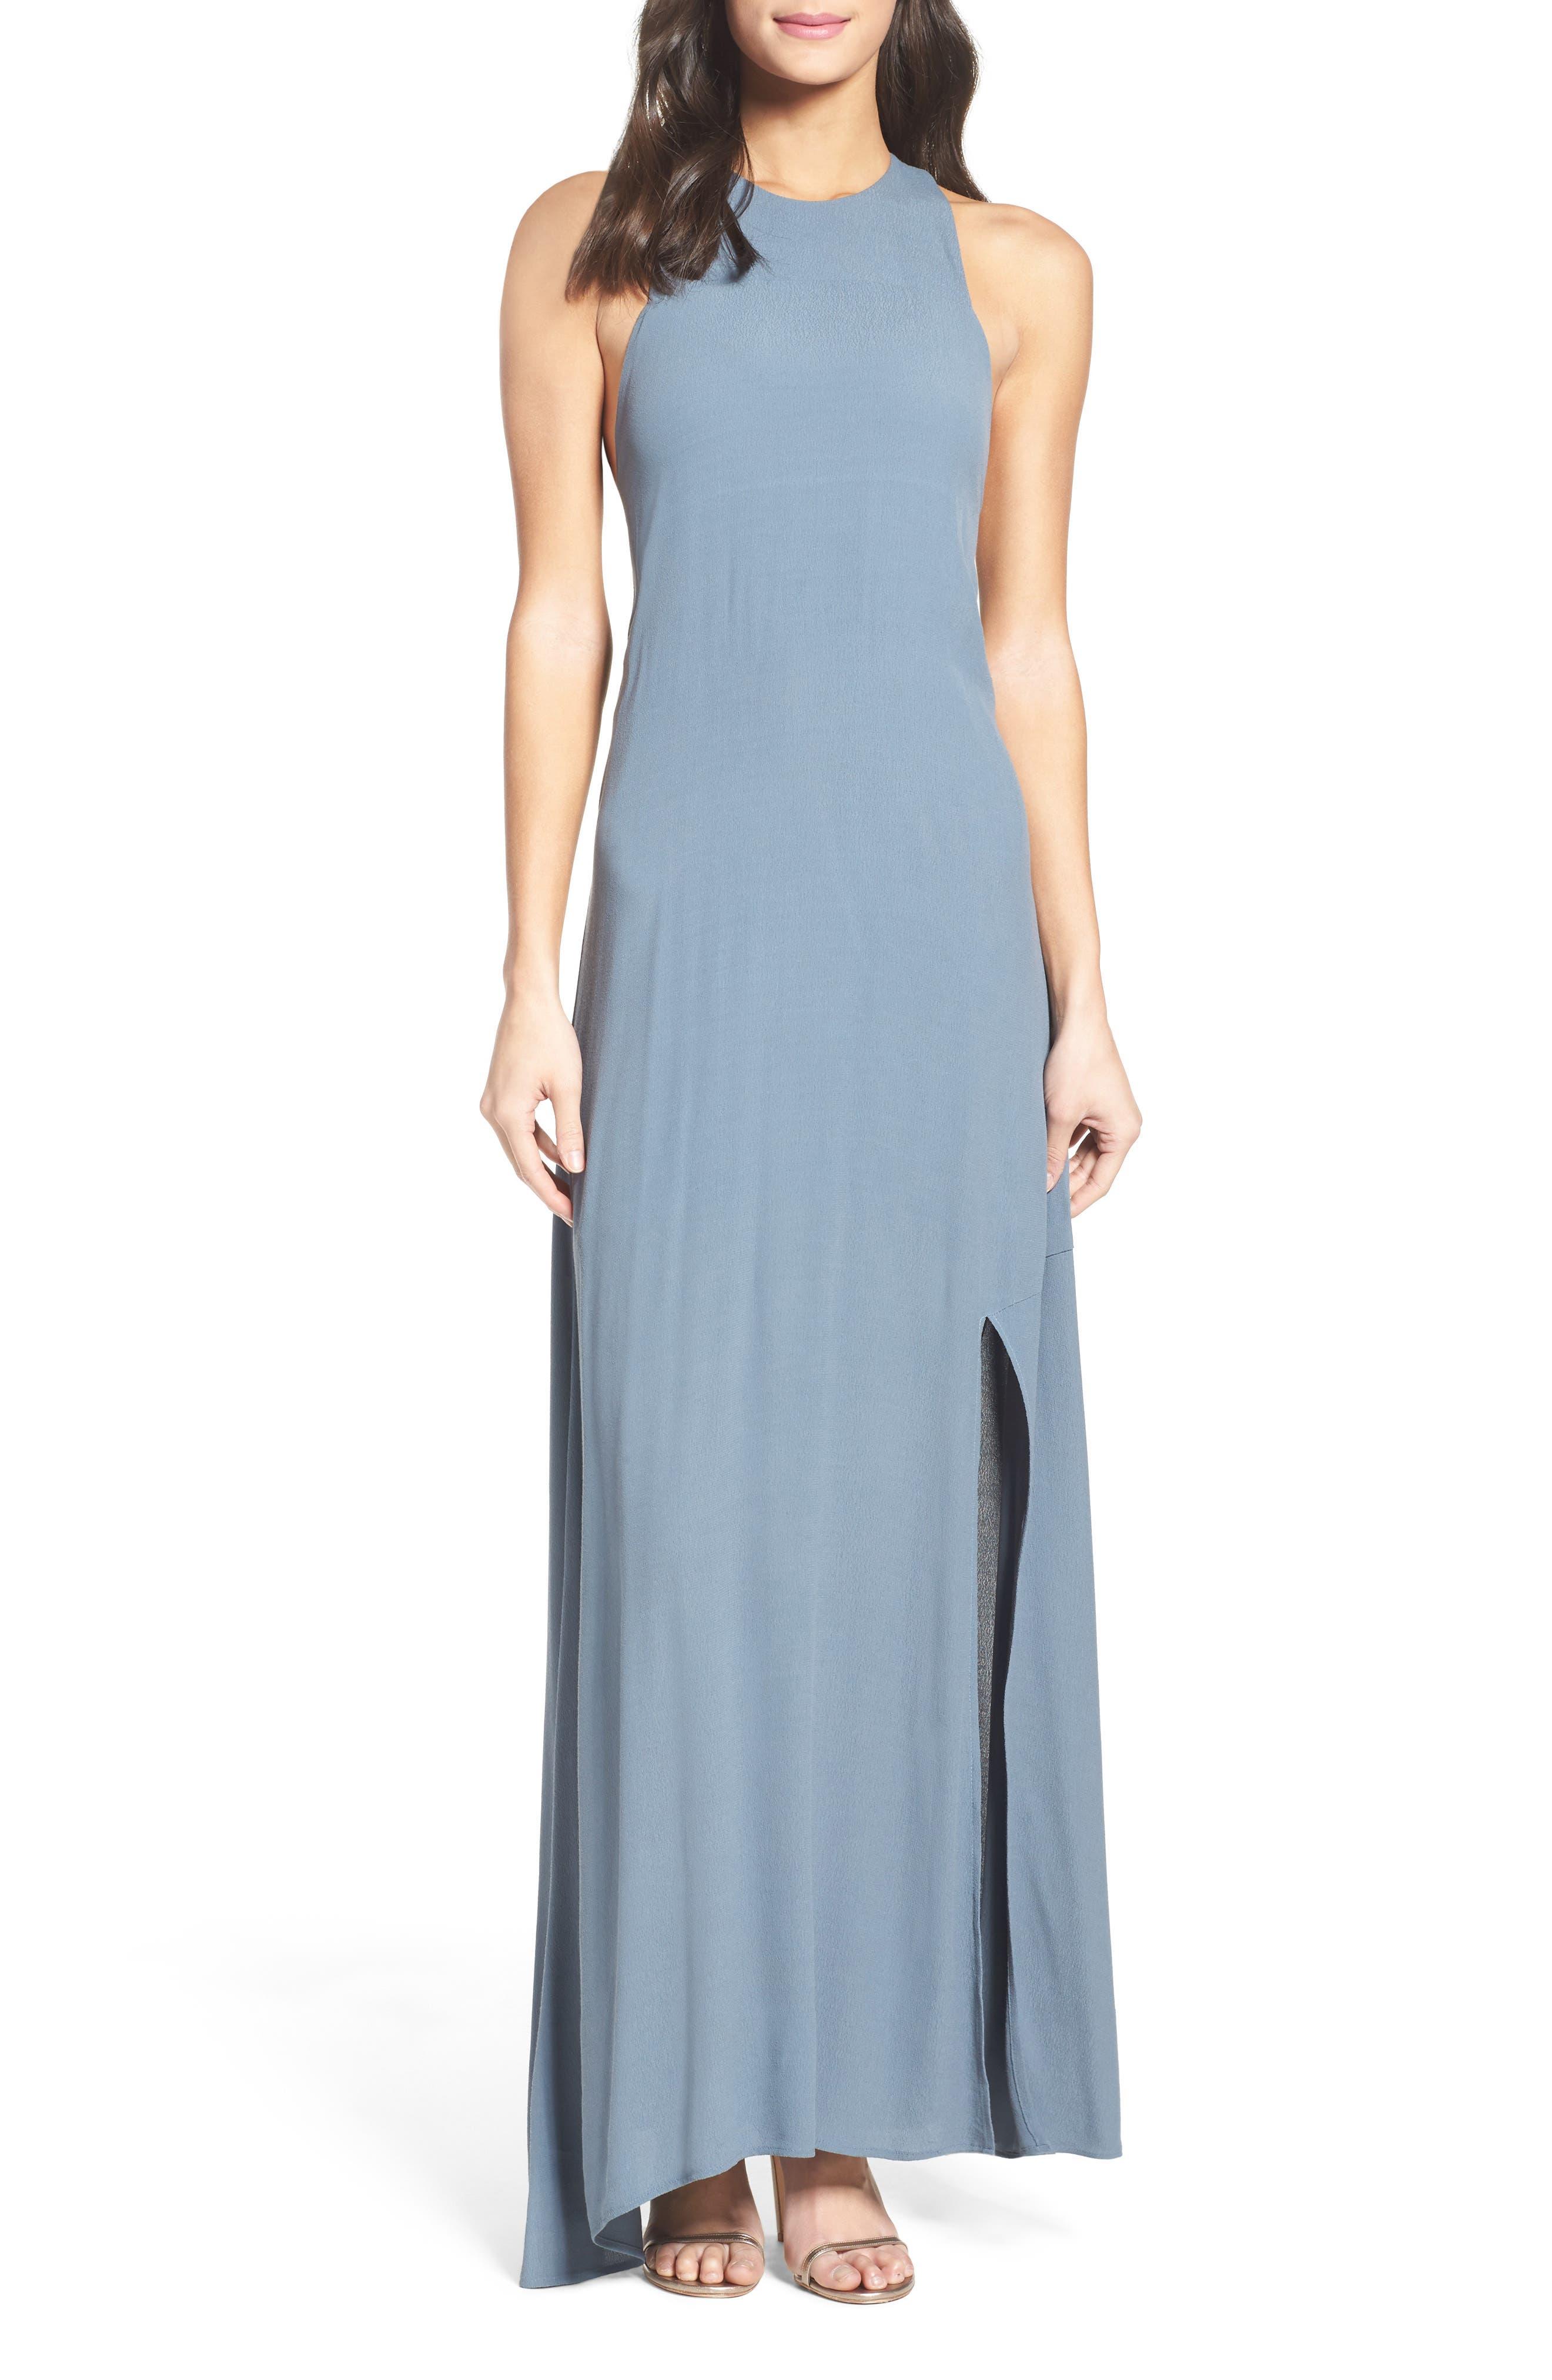 Main Image - Roe + May Bordeaux Crepe Dress